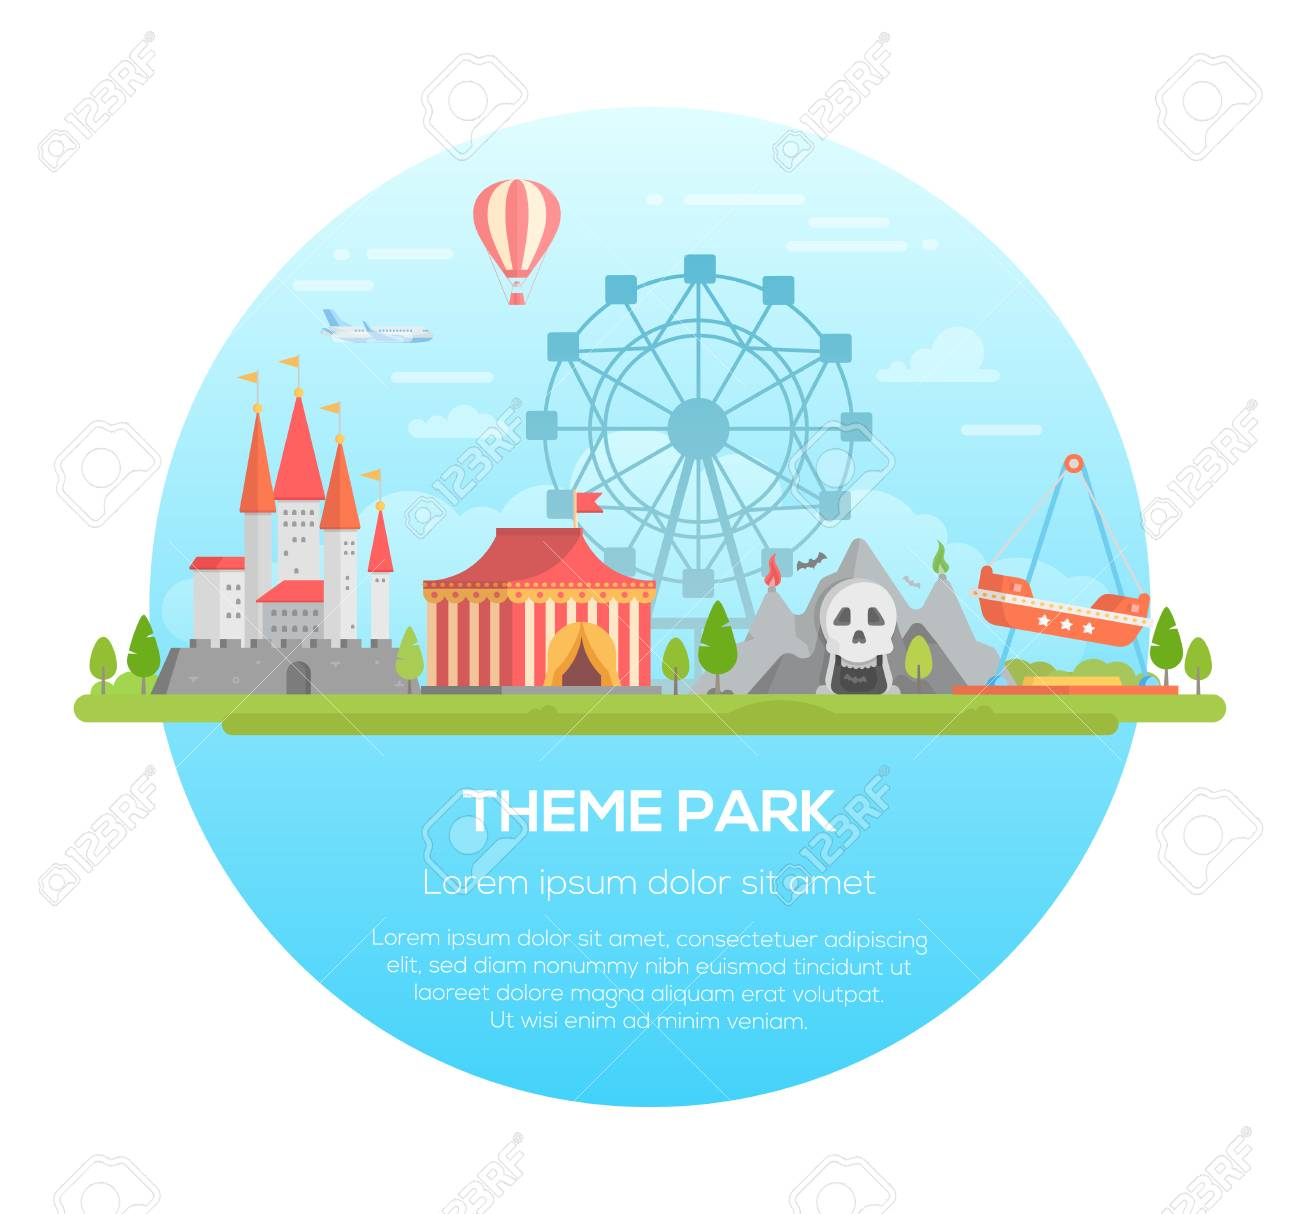 Theme park - modern vector illustration - 90668381